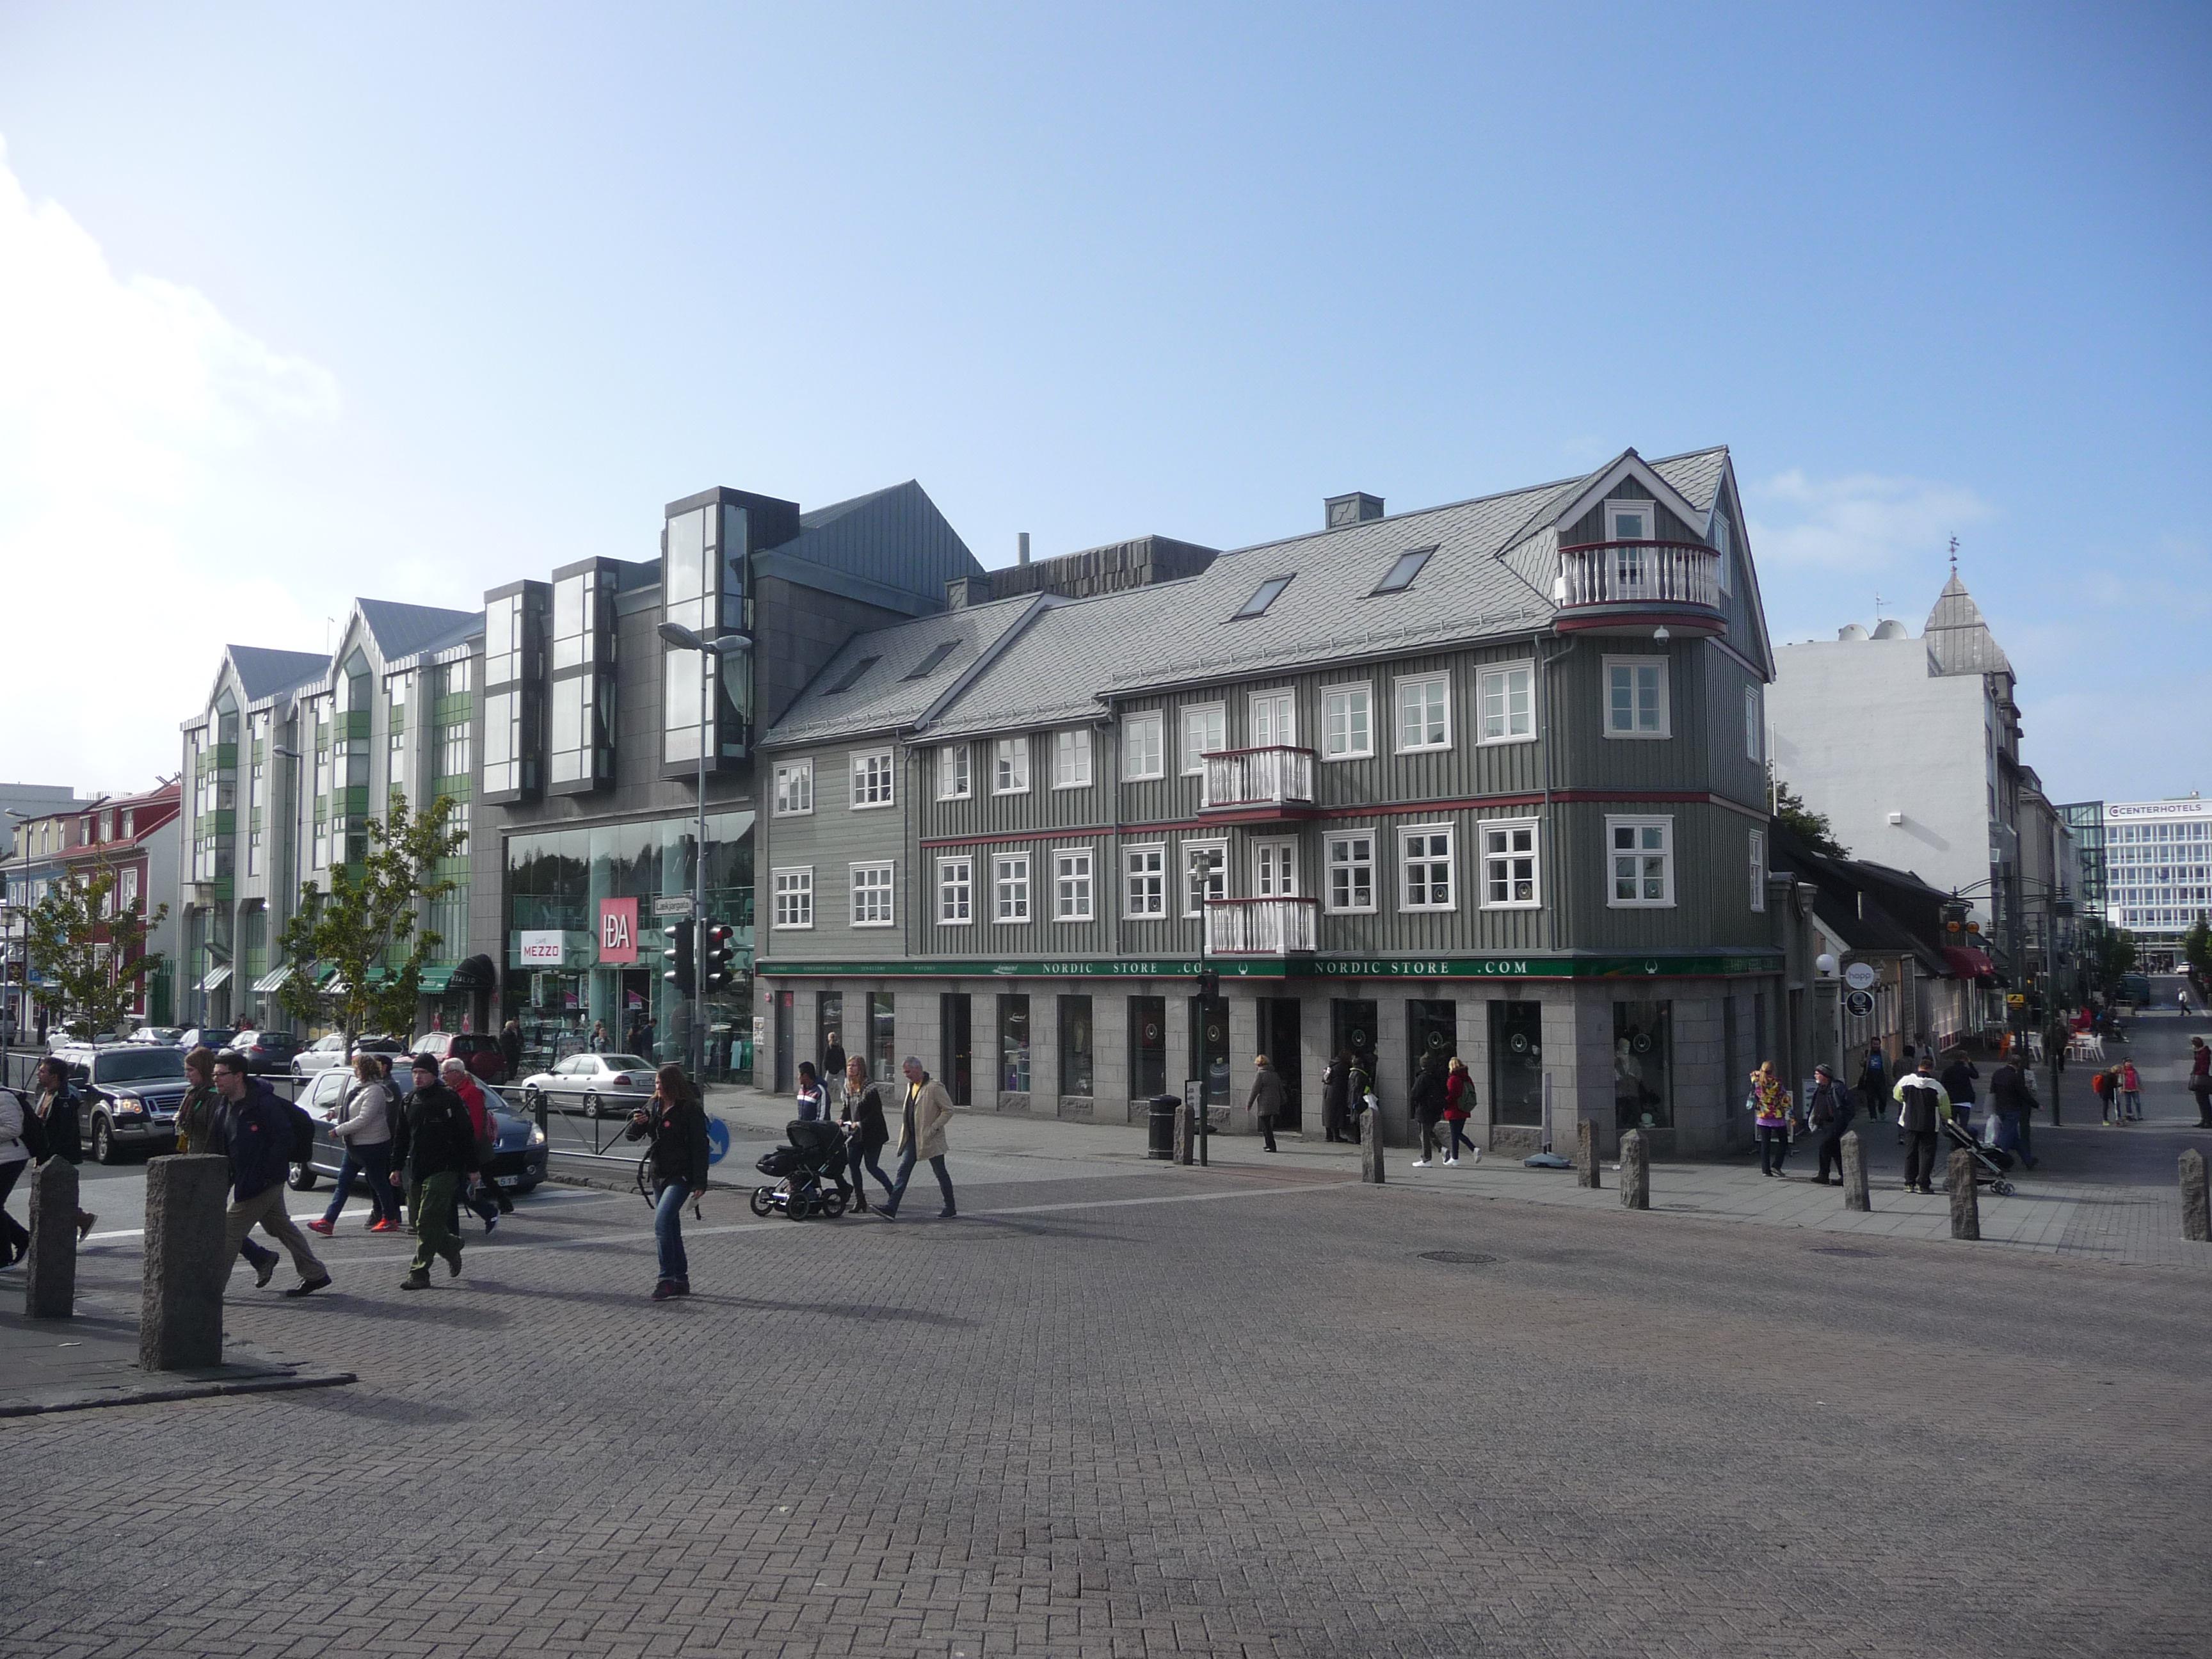 Reykjavik - capital city